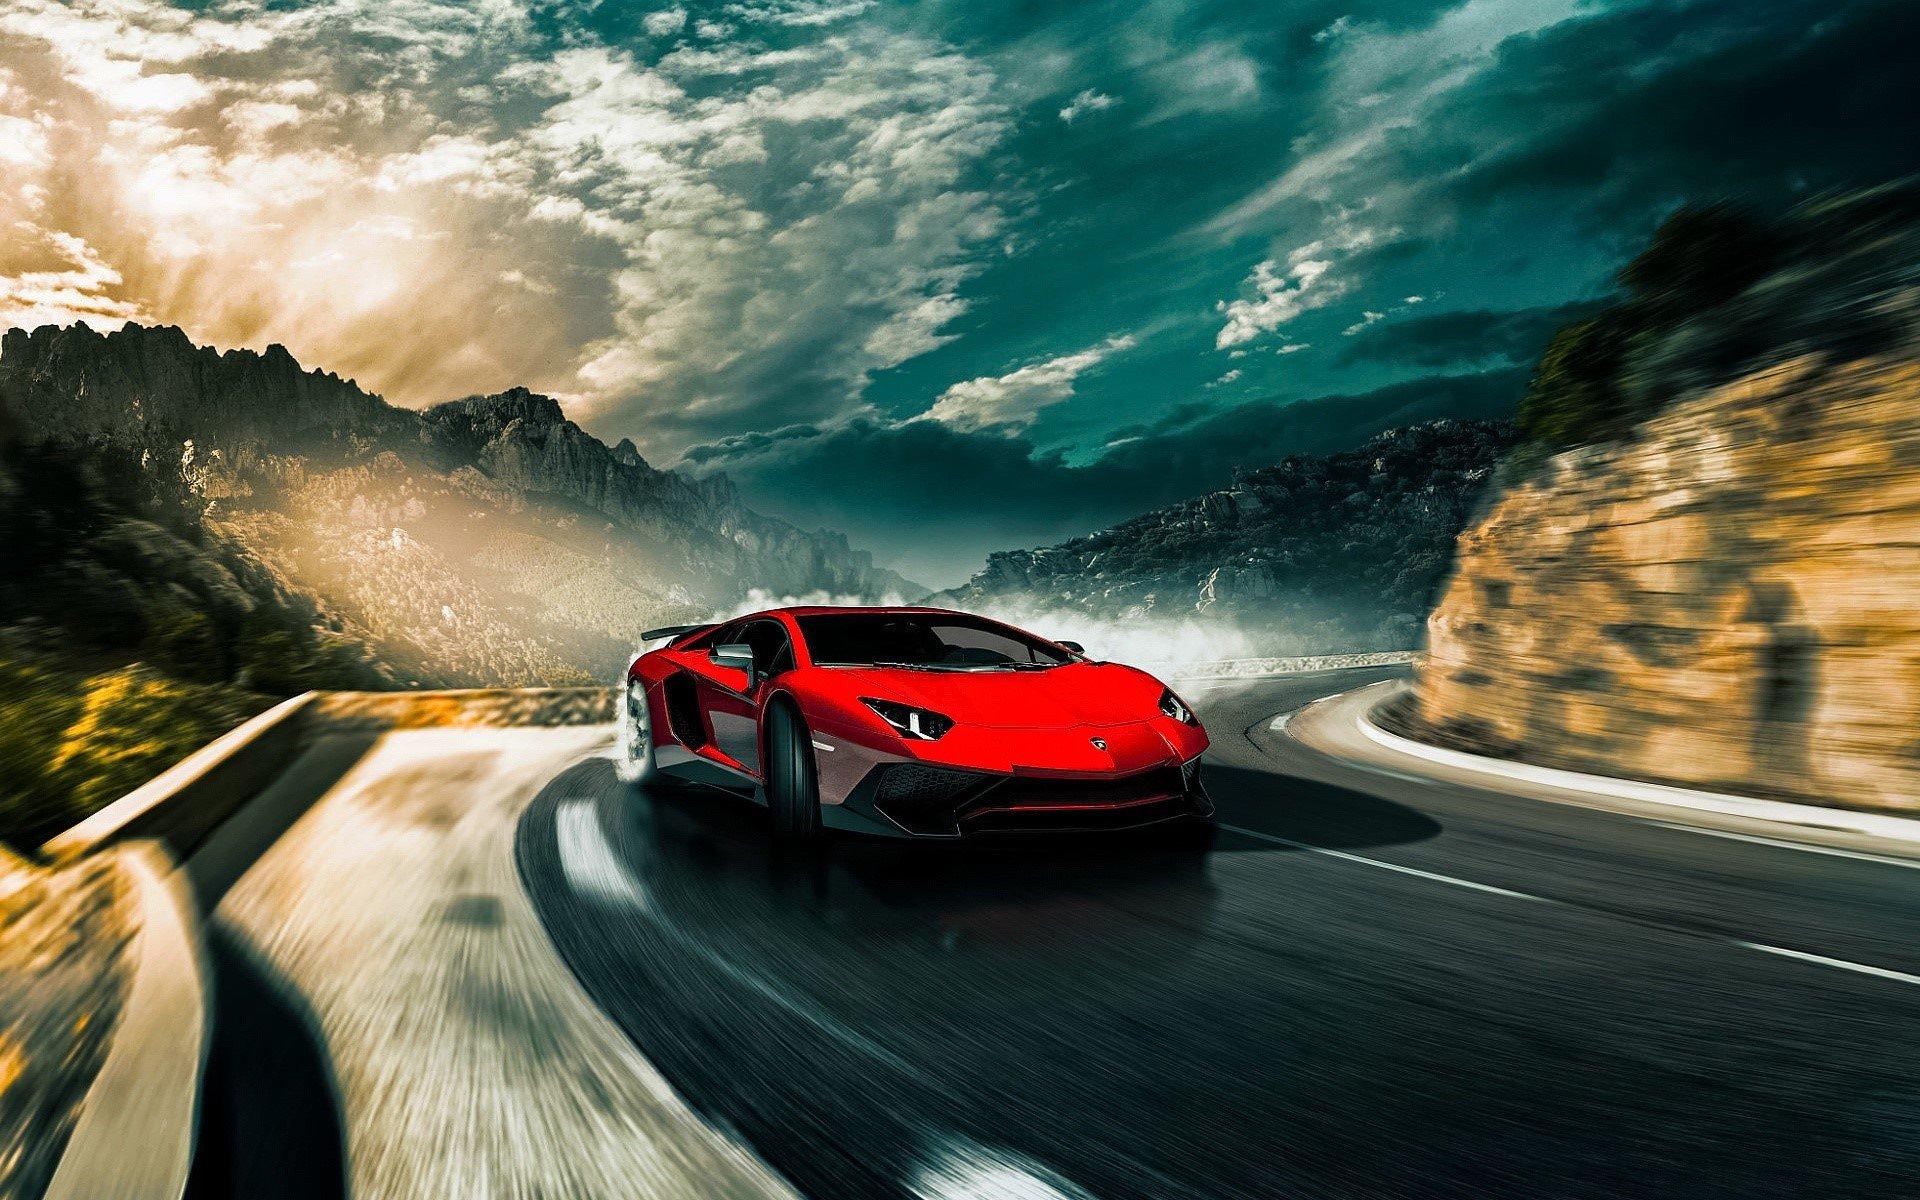 Wallpaper Lamborghini Aventador SV LP750 4 Images